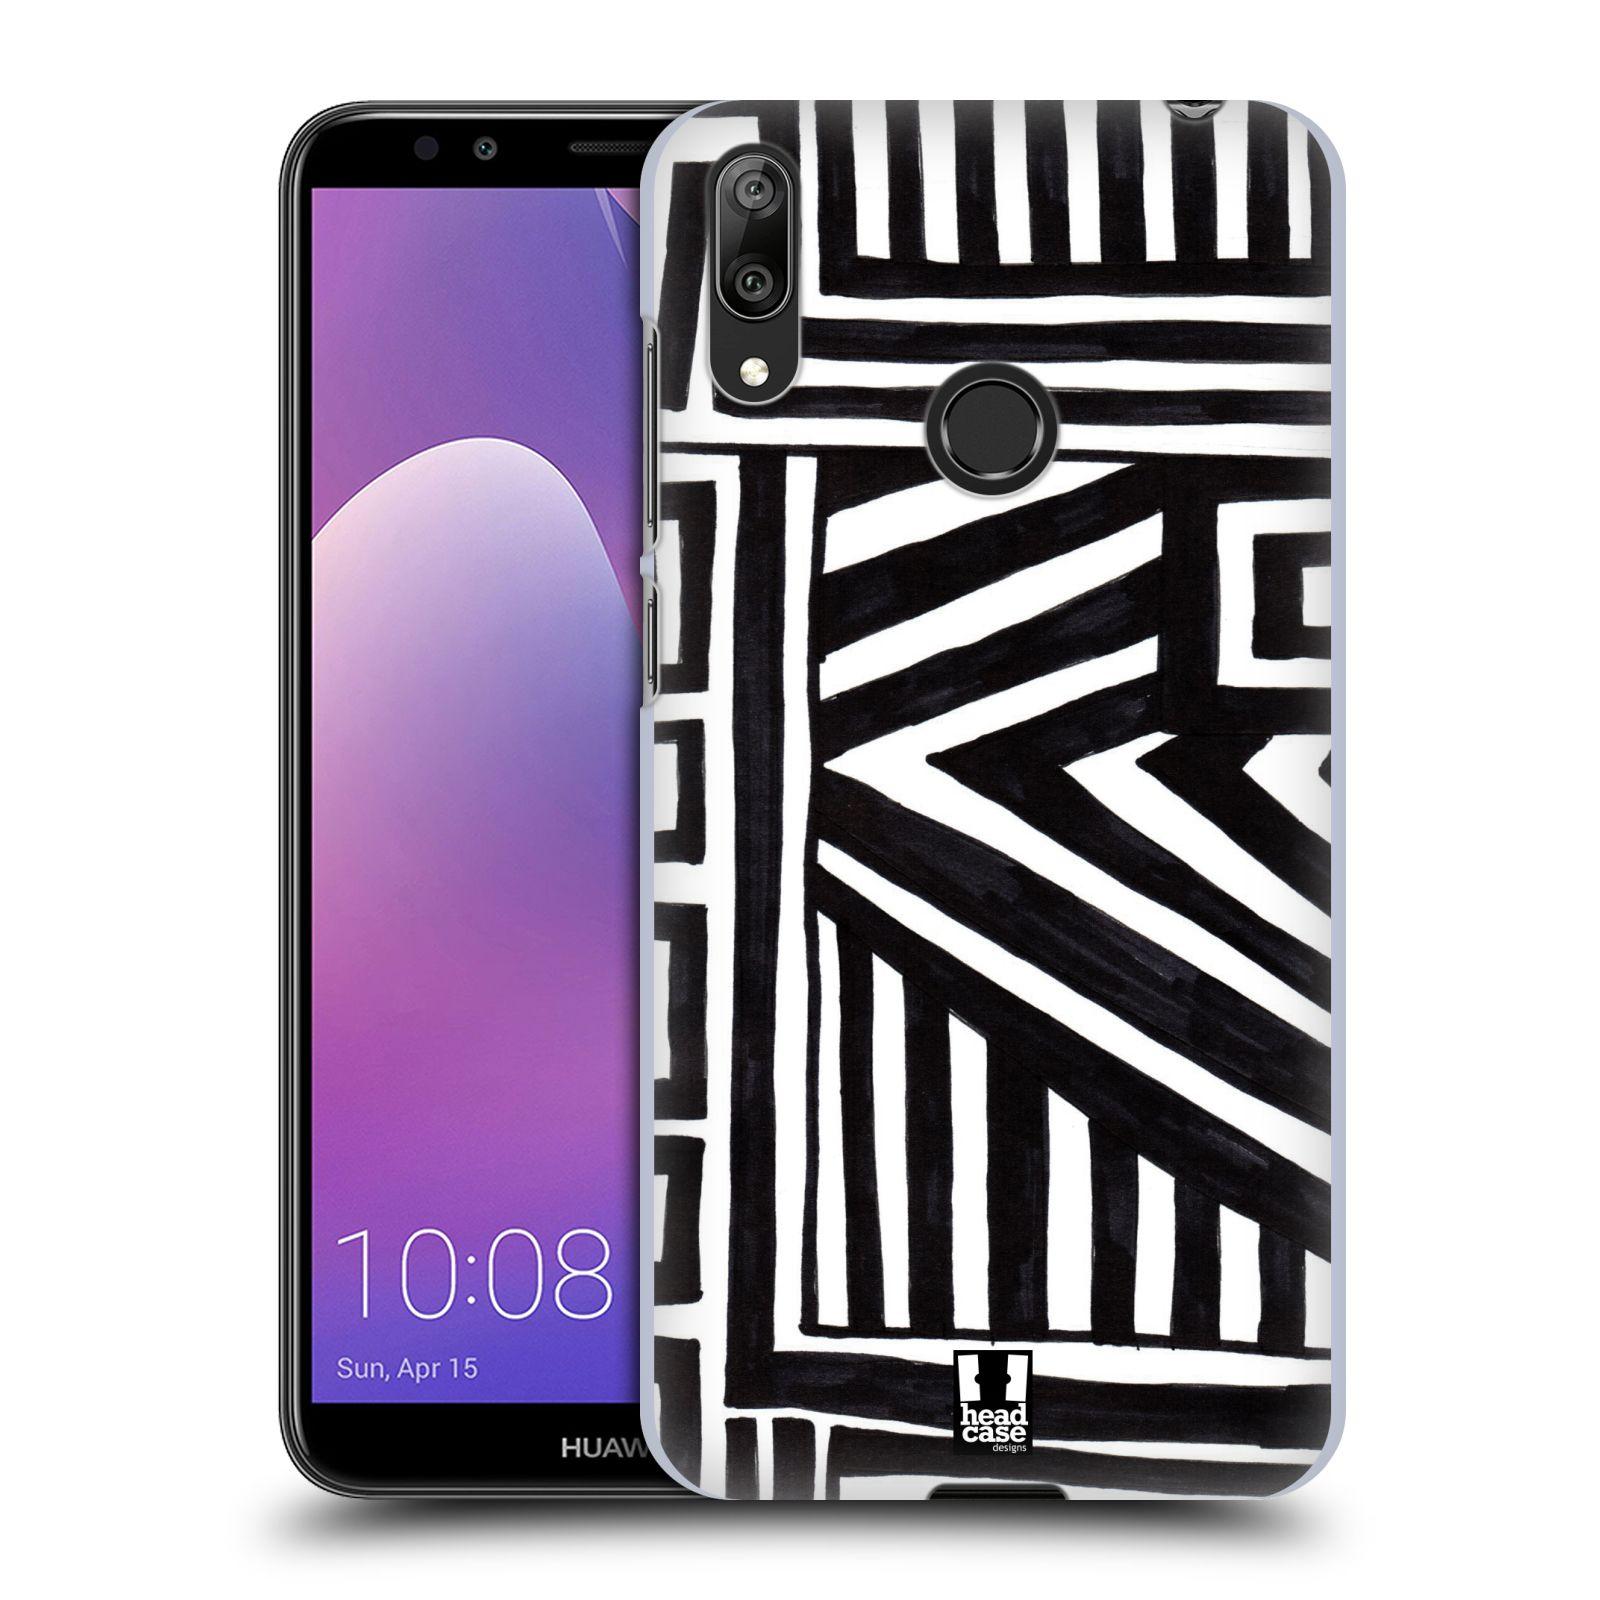 Plastové pouzdro na mobil Huawei Y7 (2019) - Head Case - DOODLE GEOMETRIC